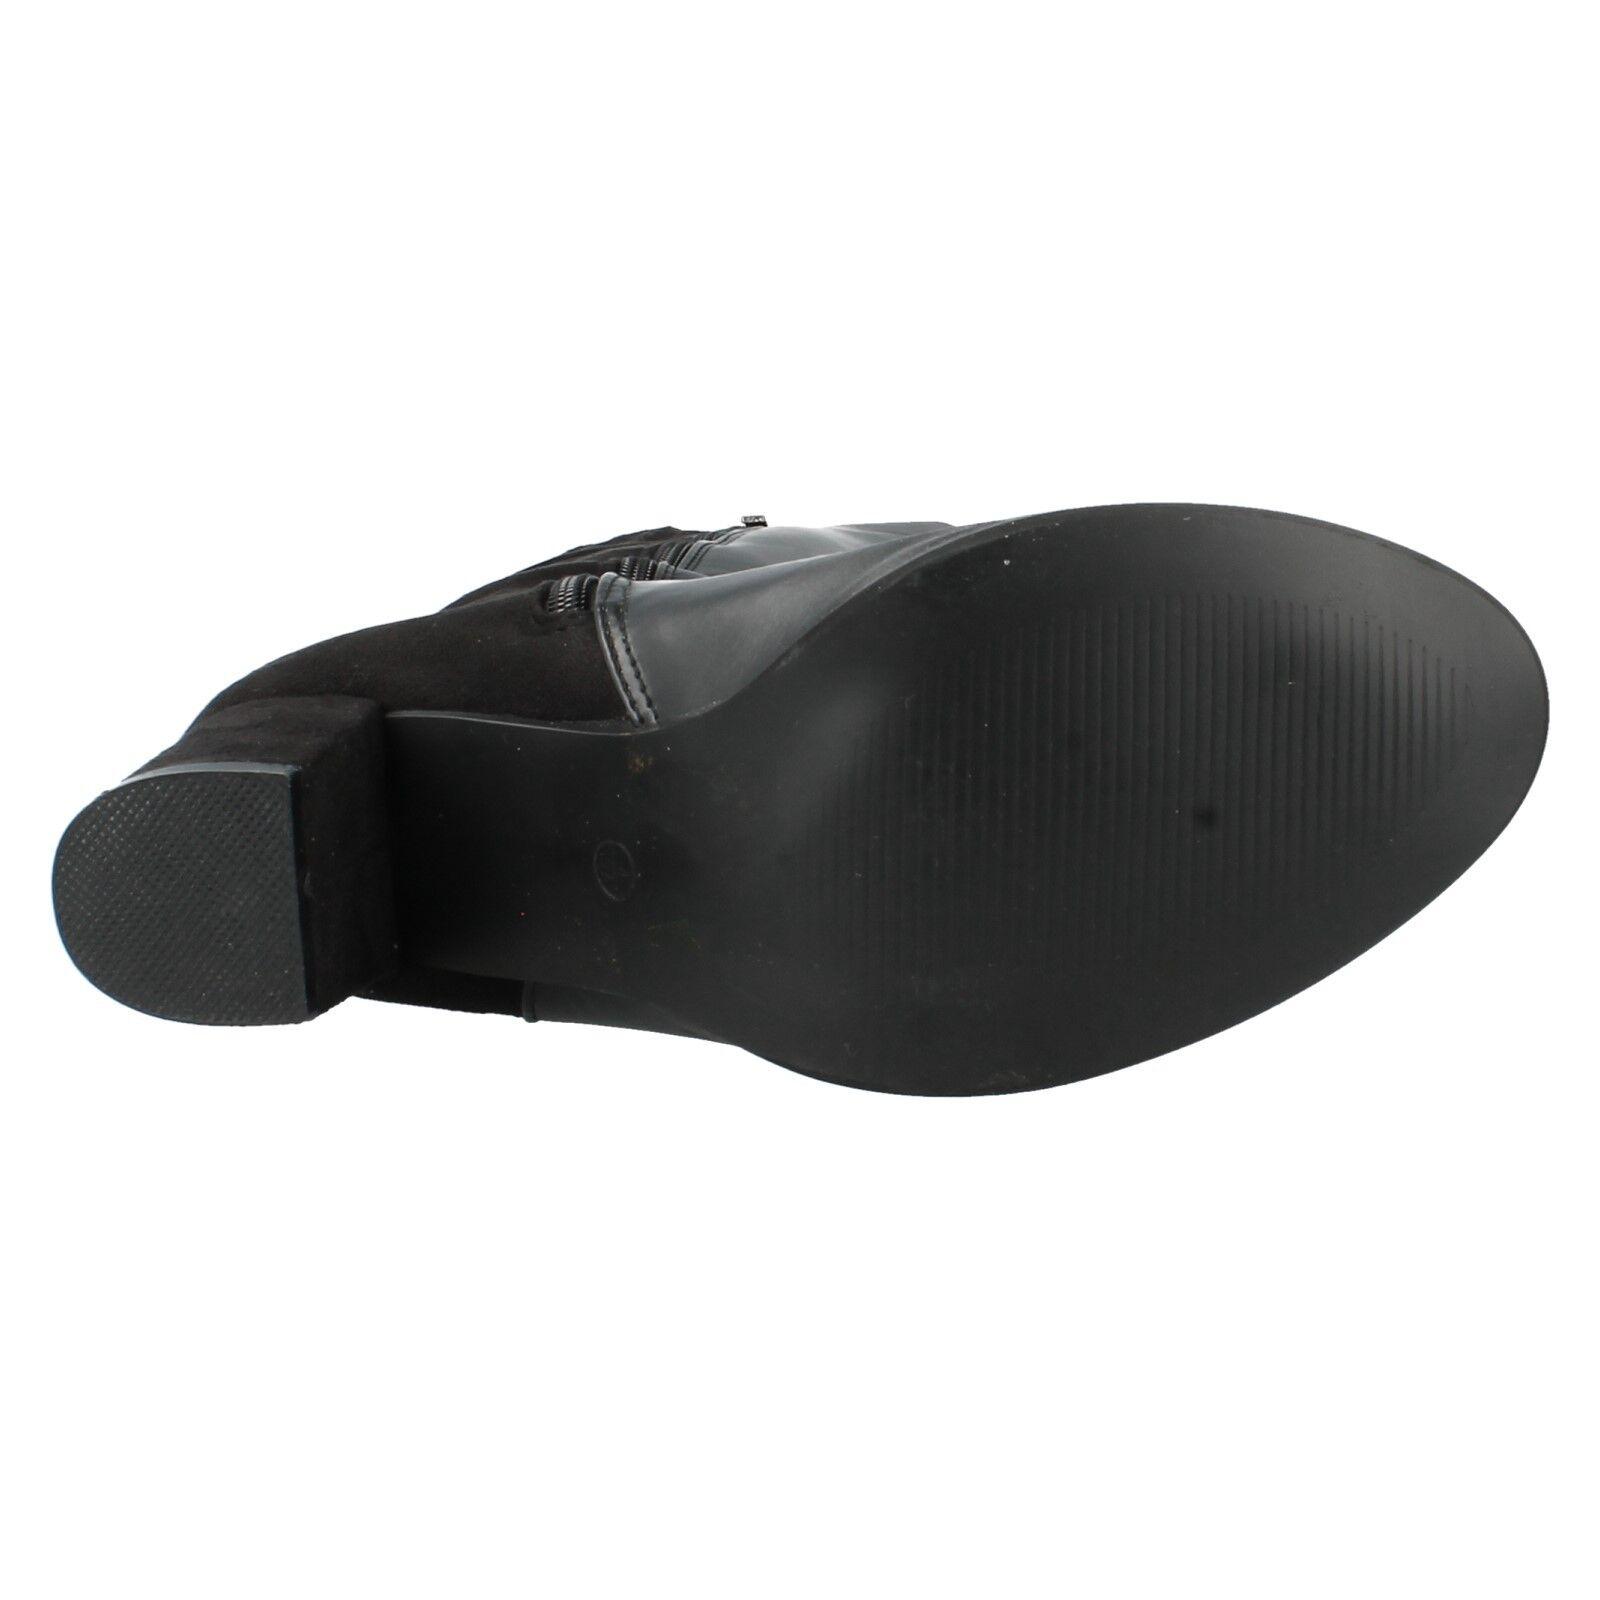 SPOT ON LADIES F50366 ZIP UP KNEE SMART FORMAL HEELED LONG KNEE UP LENGTH Stiefel 766c27